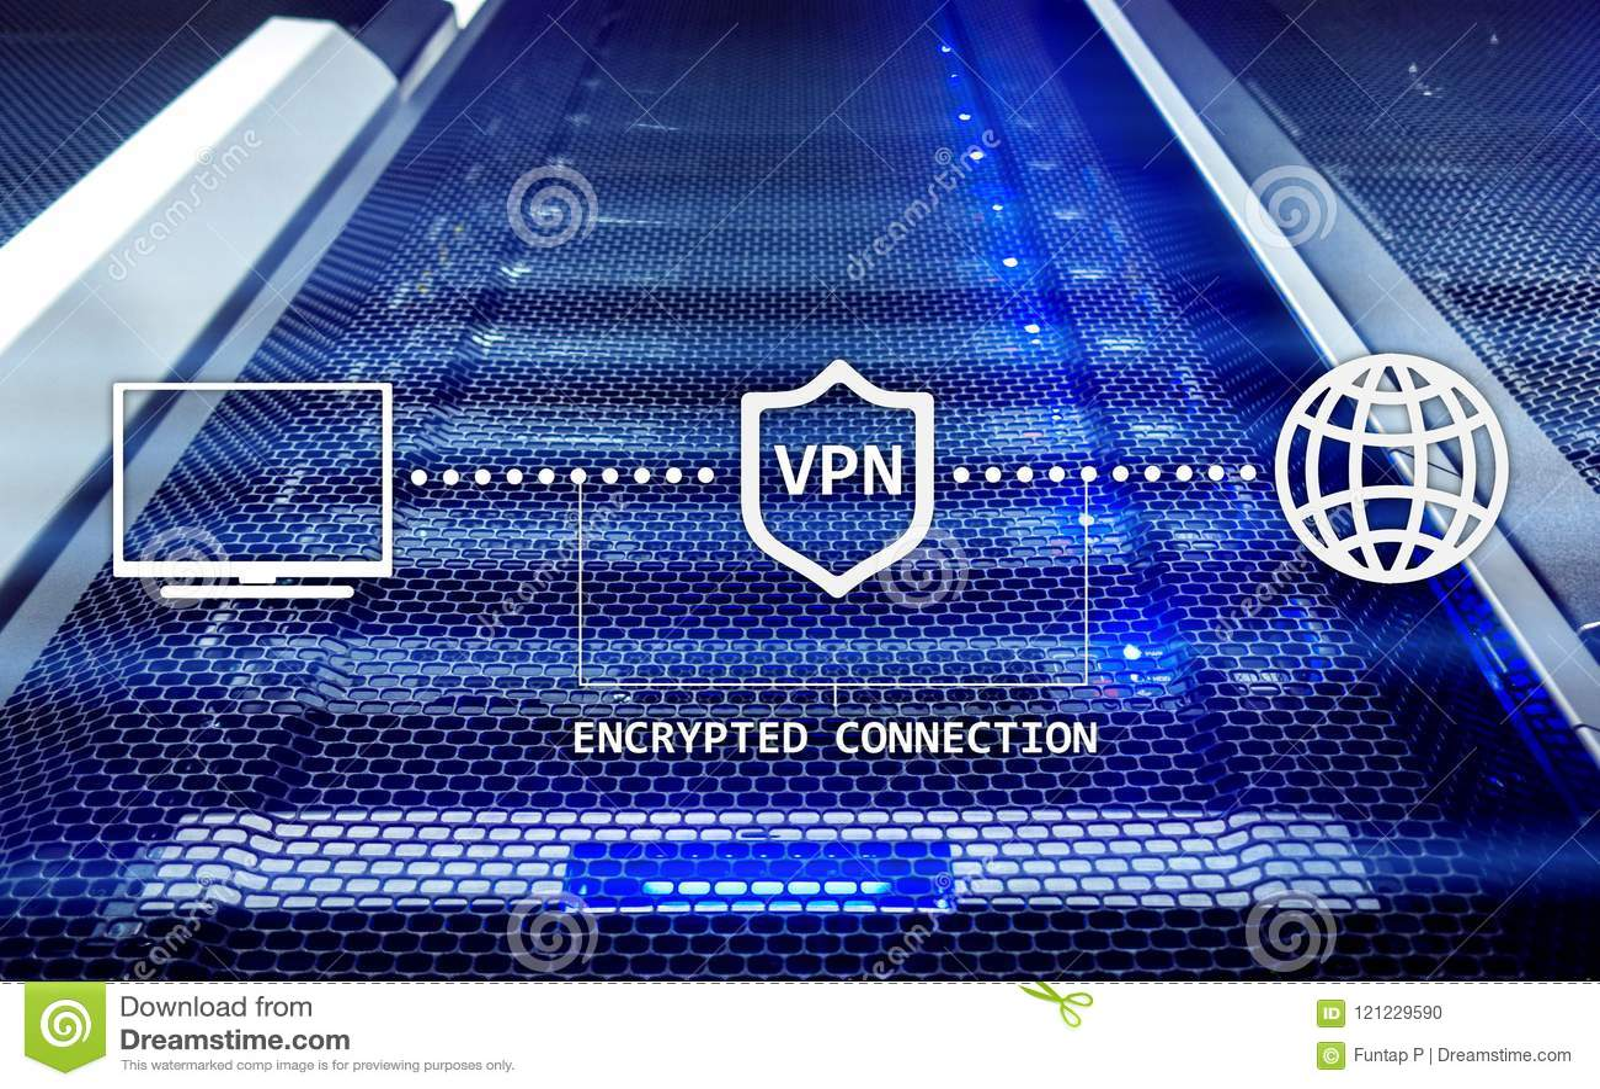 Virtueel privé netwerk, VPN, Gegevensencryptie, IP substituut